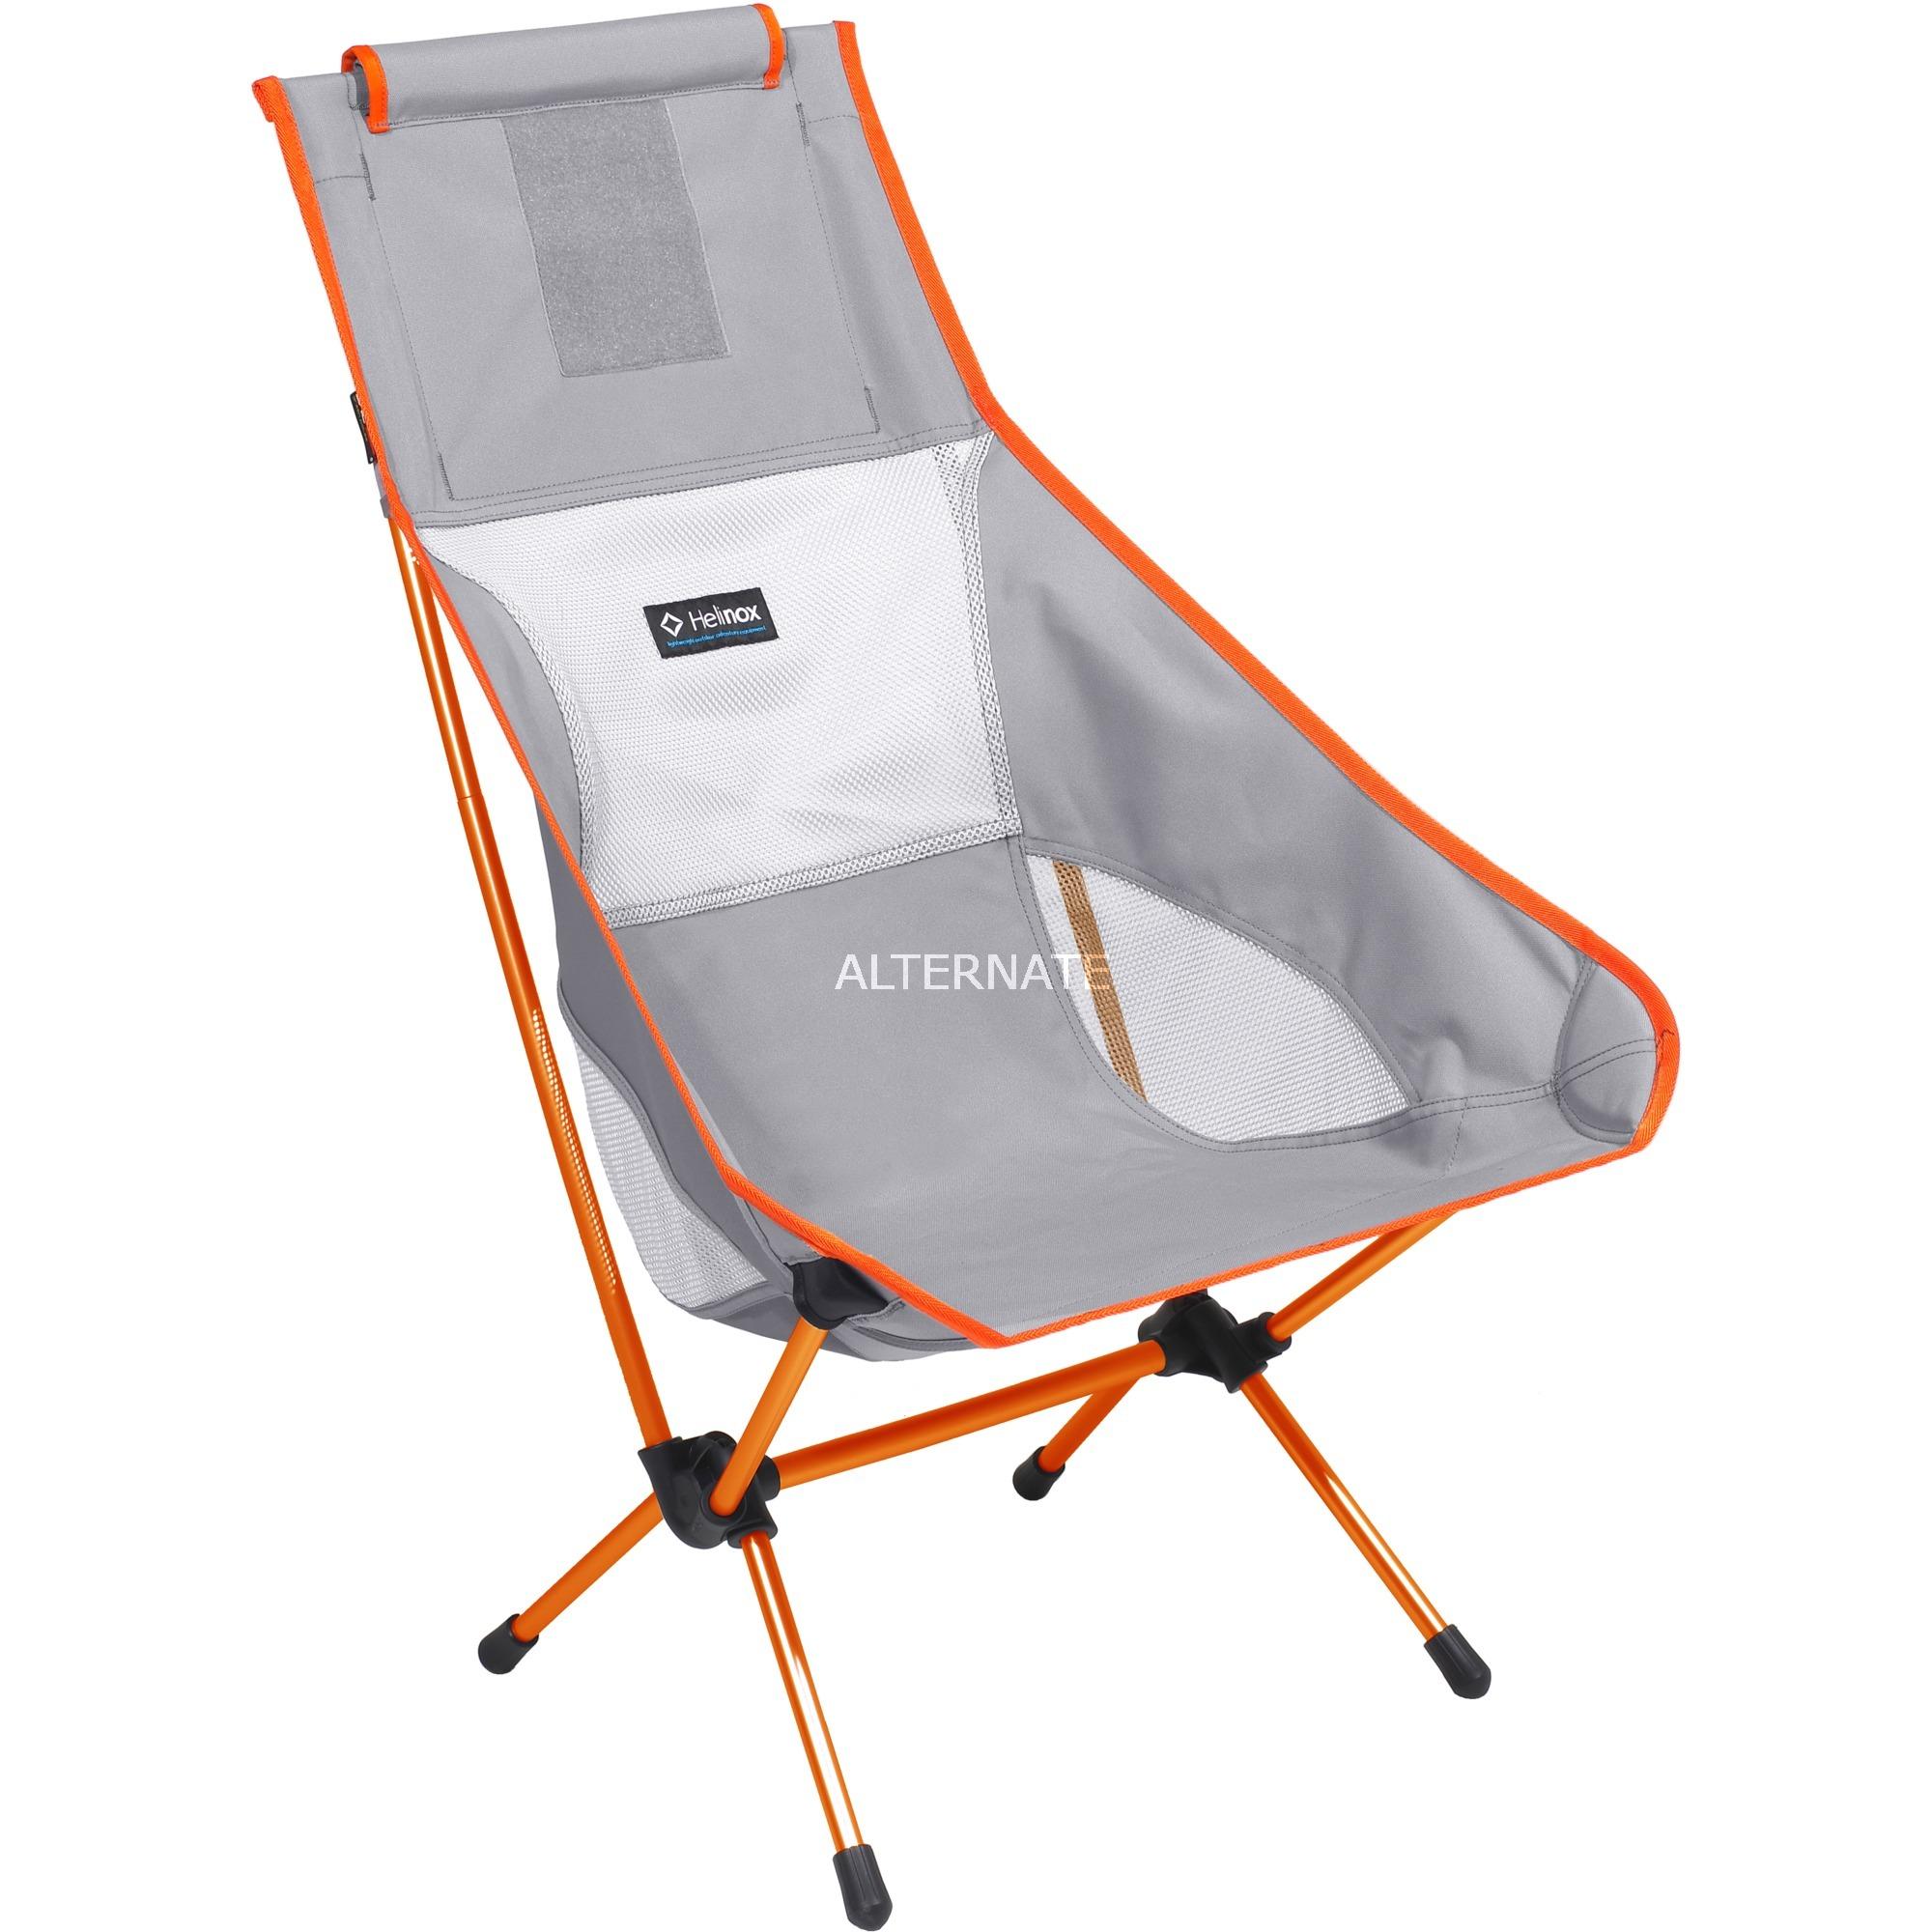 La Chaise Longue Billard camping et randonnée helinox chair two camping chair camping